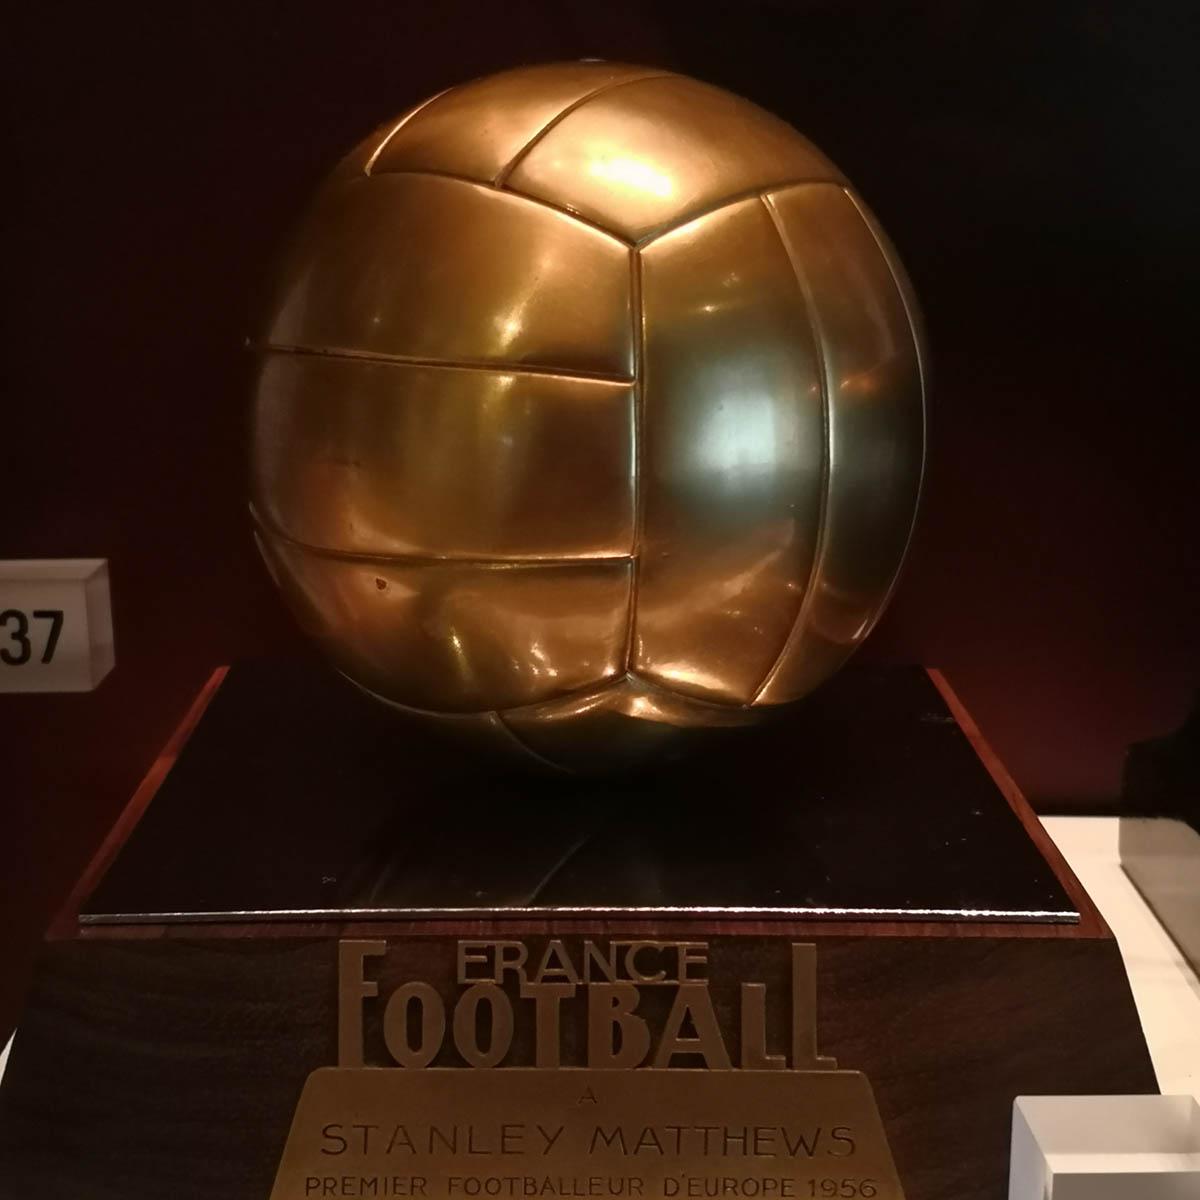 stanley matthews ballon d'or